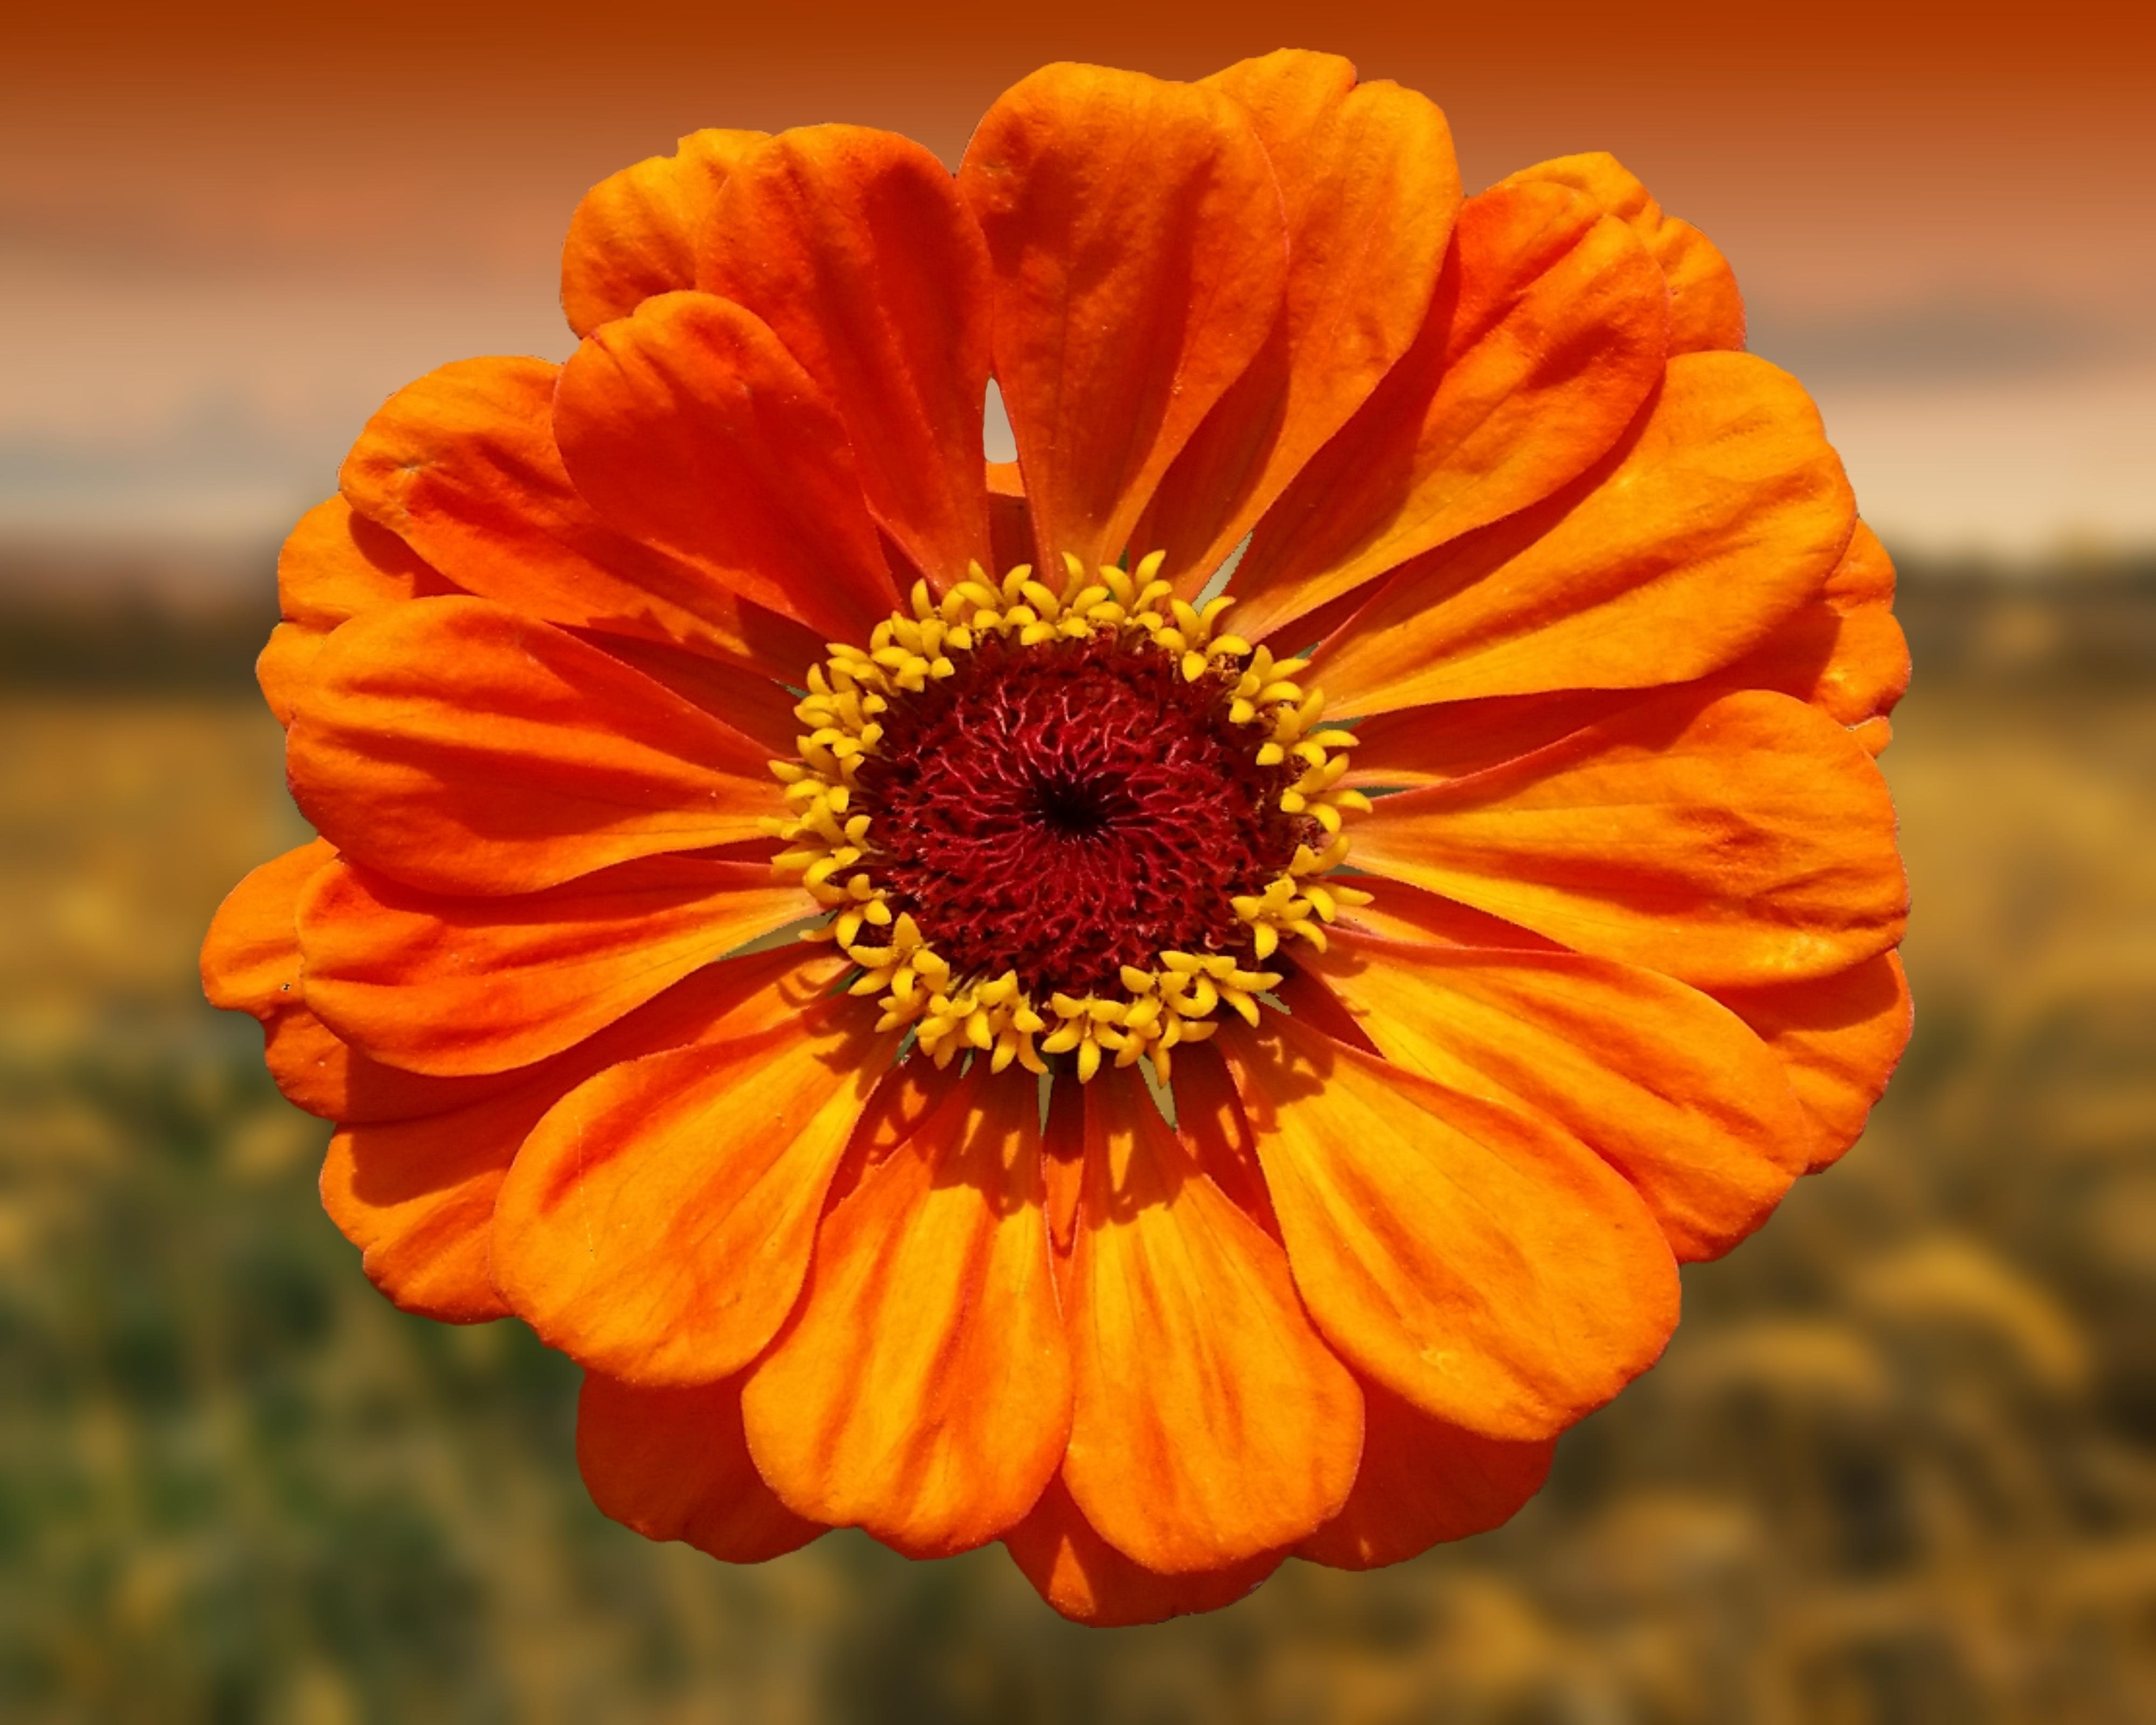 Картинки желто оранжевых цветов